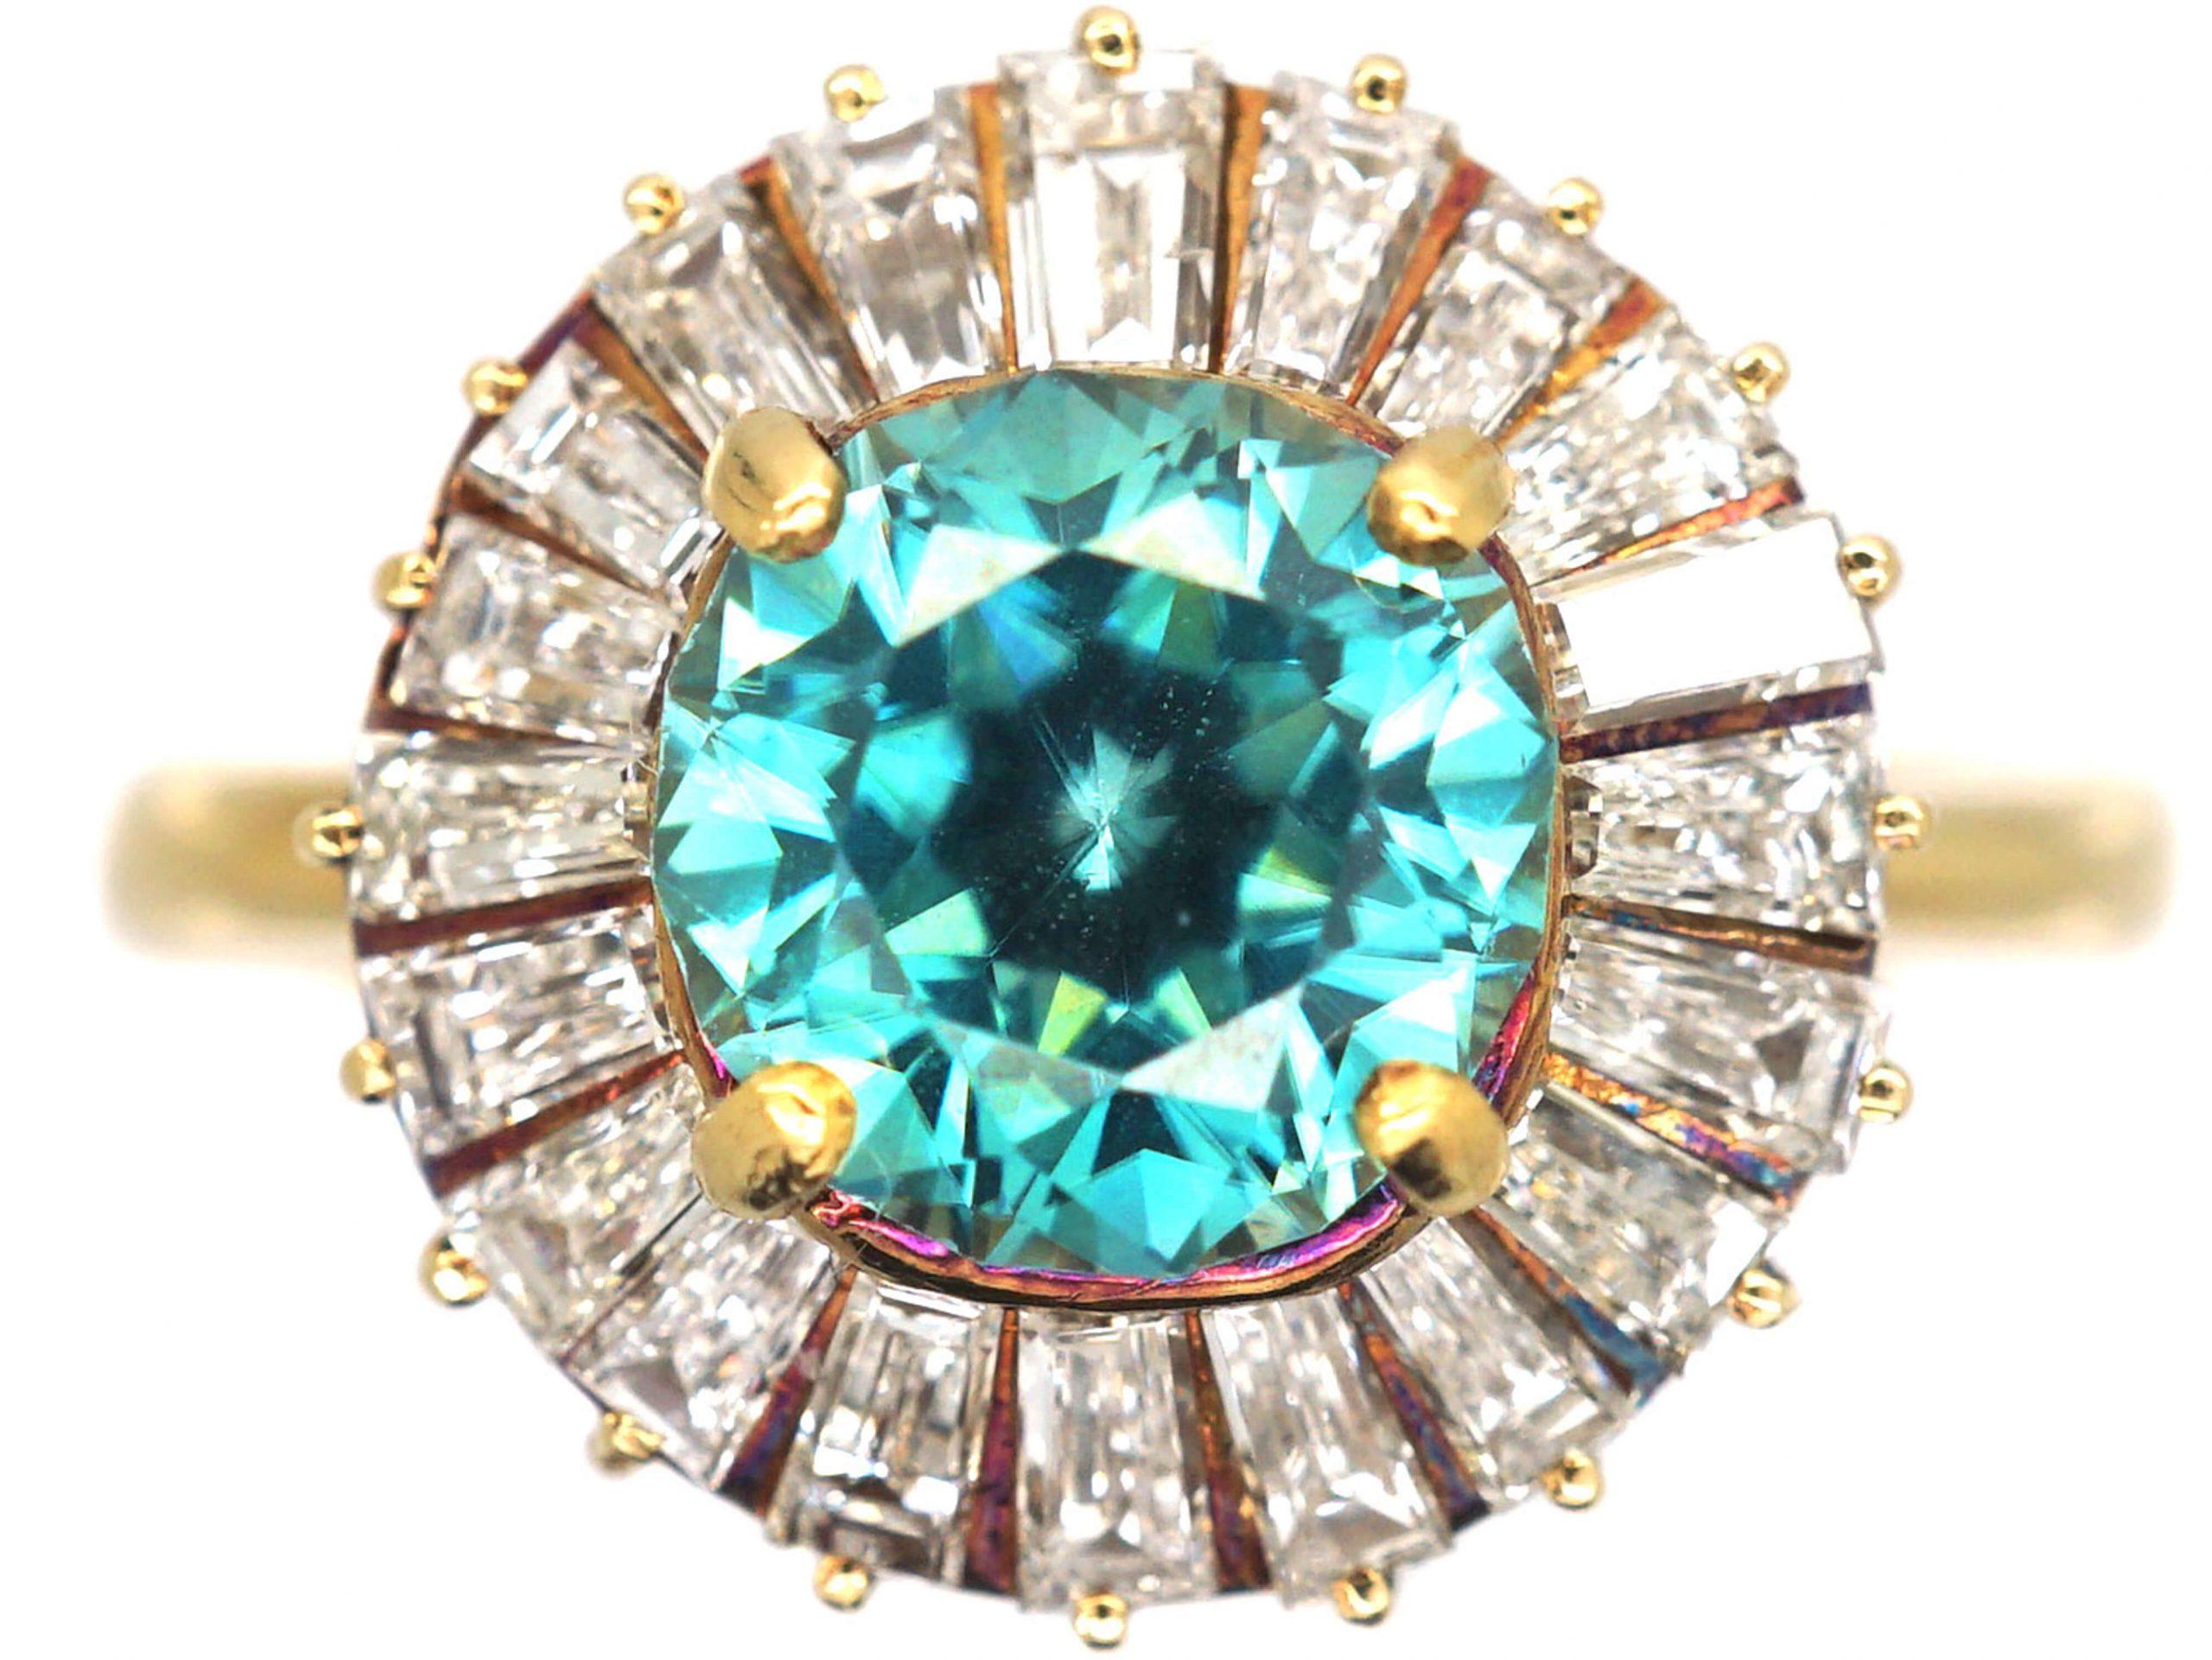 18ct Gold, Zircon & Tapered Baguette Diamond Ballerina Ring